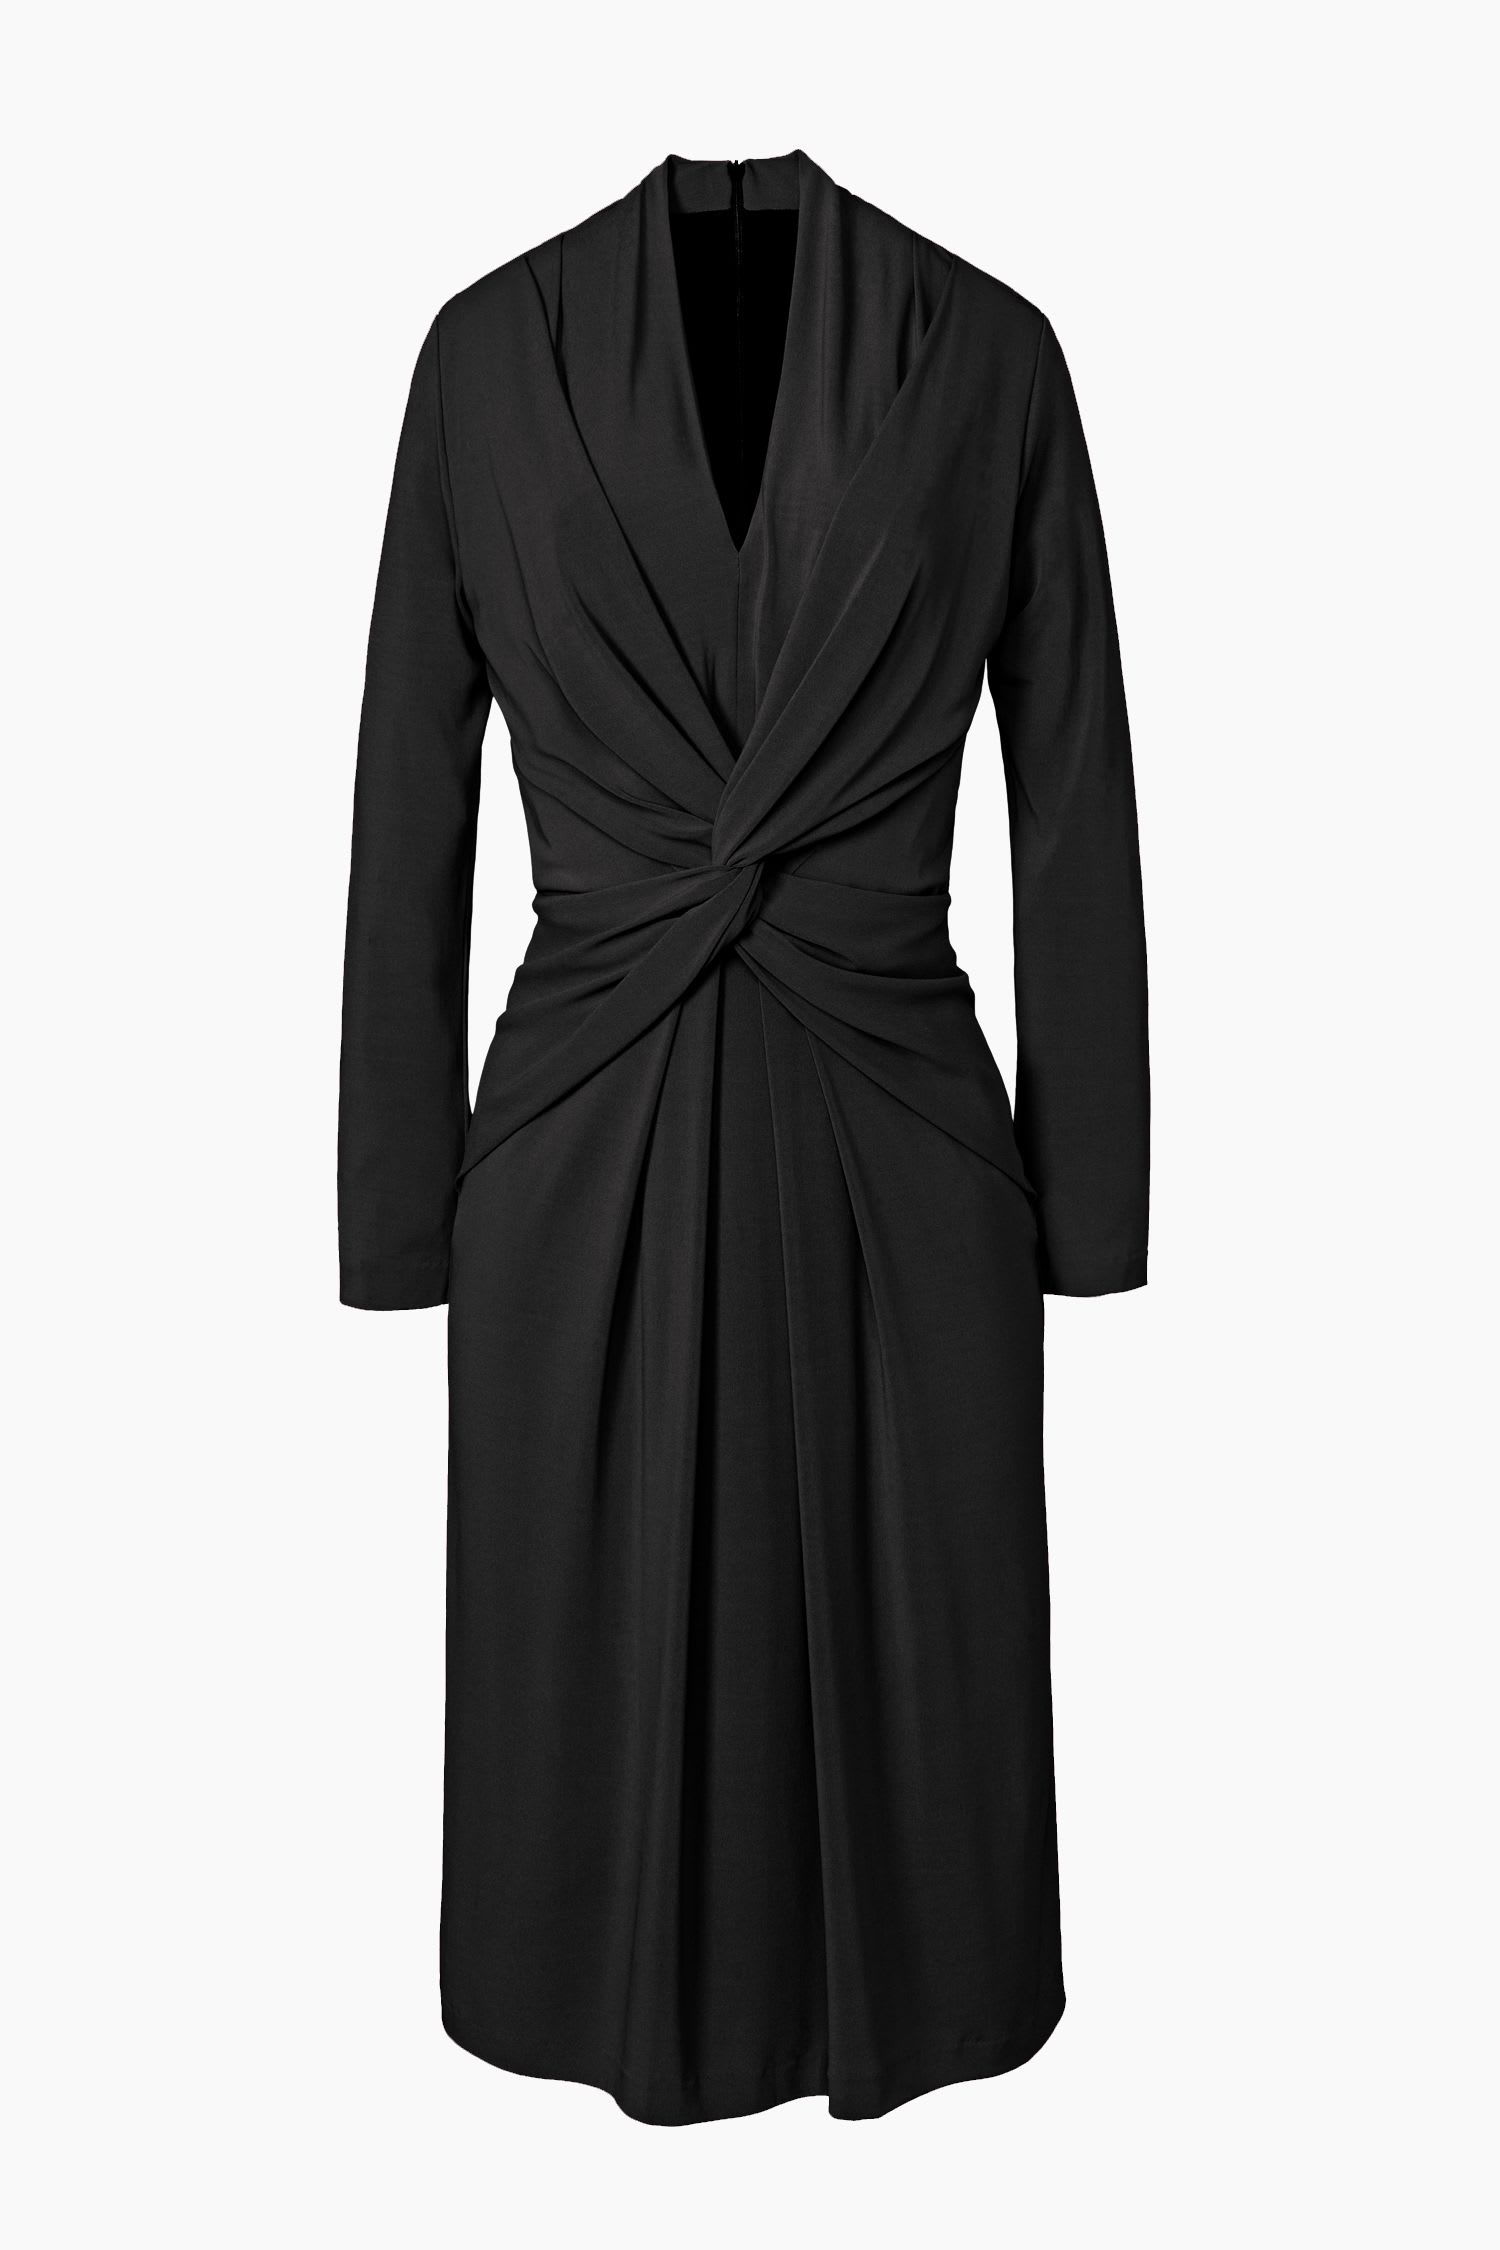 9712e391b75 Blair Dress    Black 1